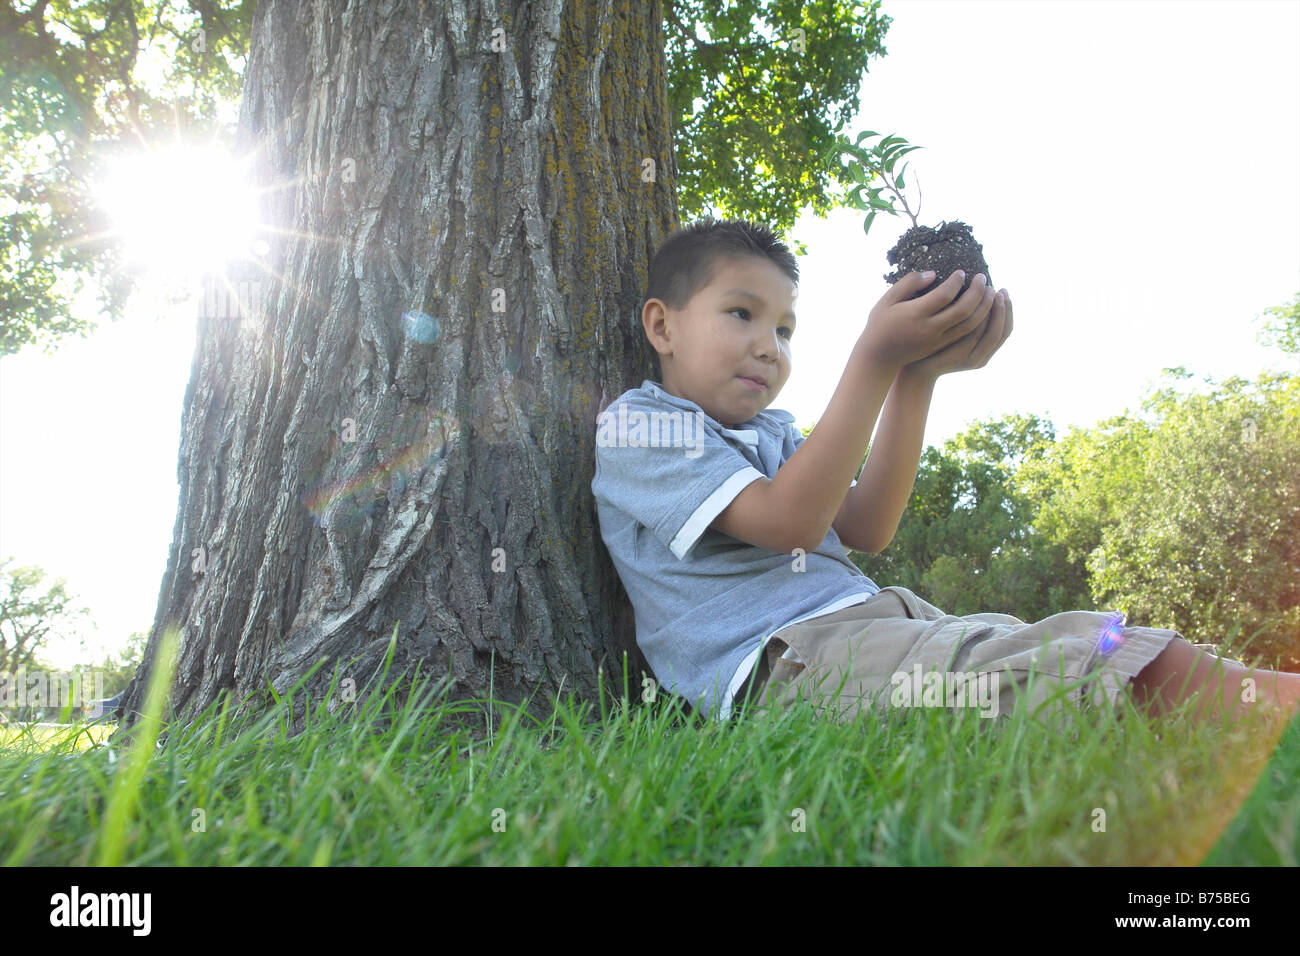 Six year old boy holds small tree, seated beside large tree, Winnipeg, Canada - Stock Image